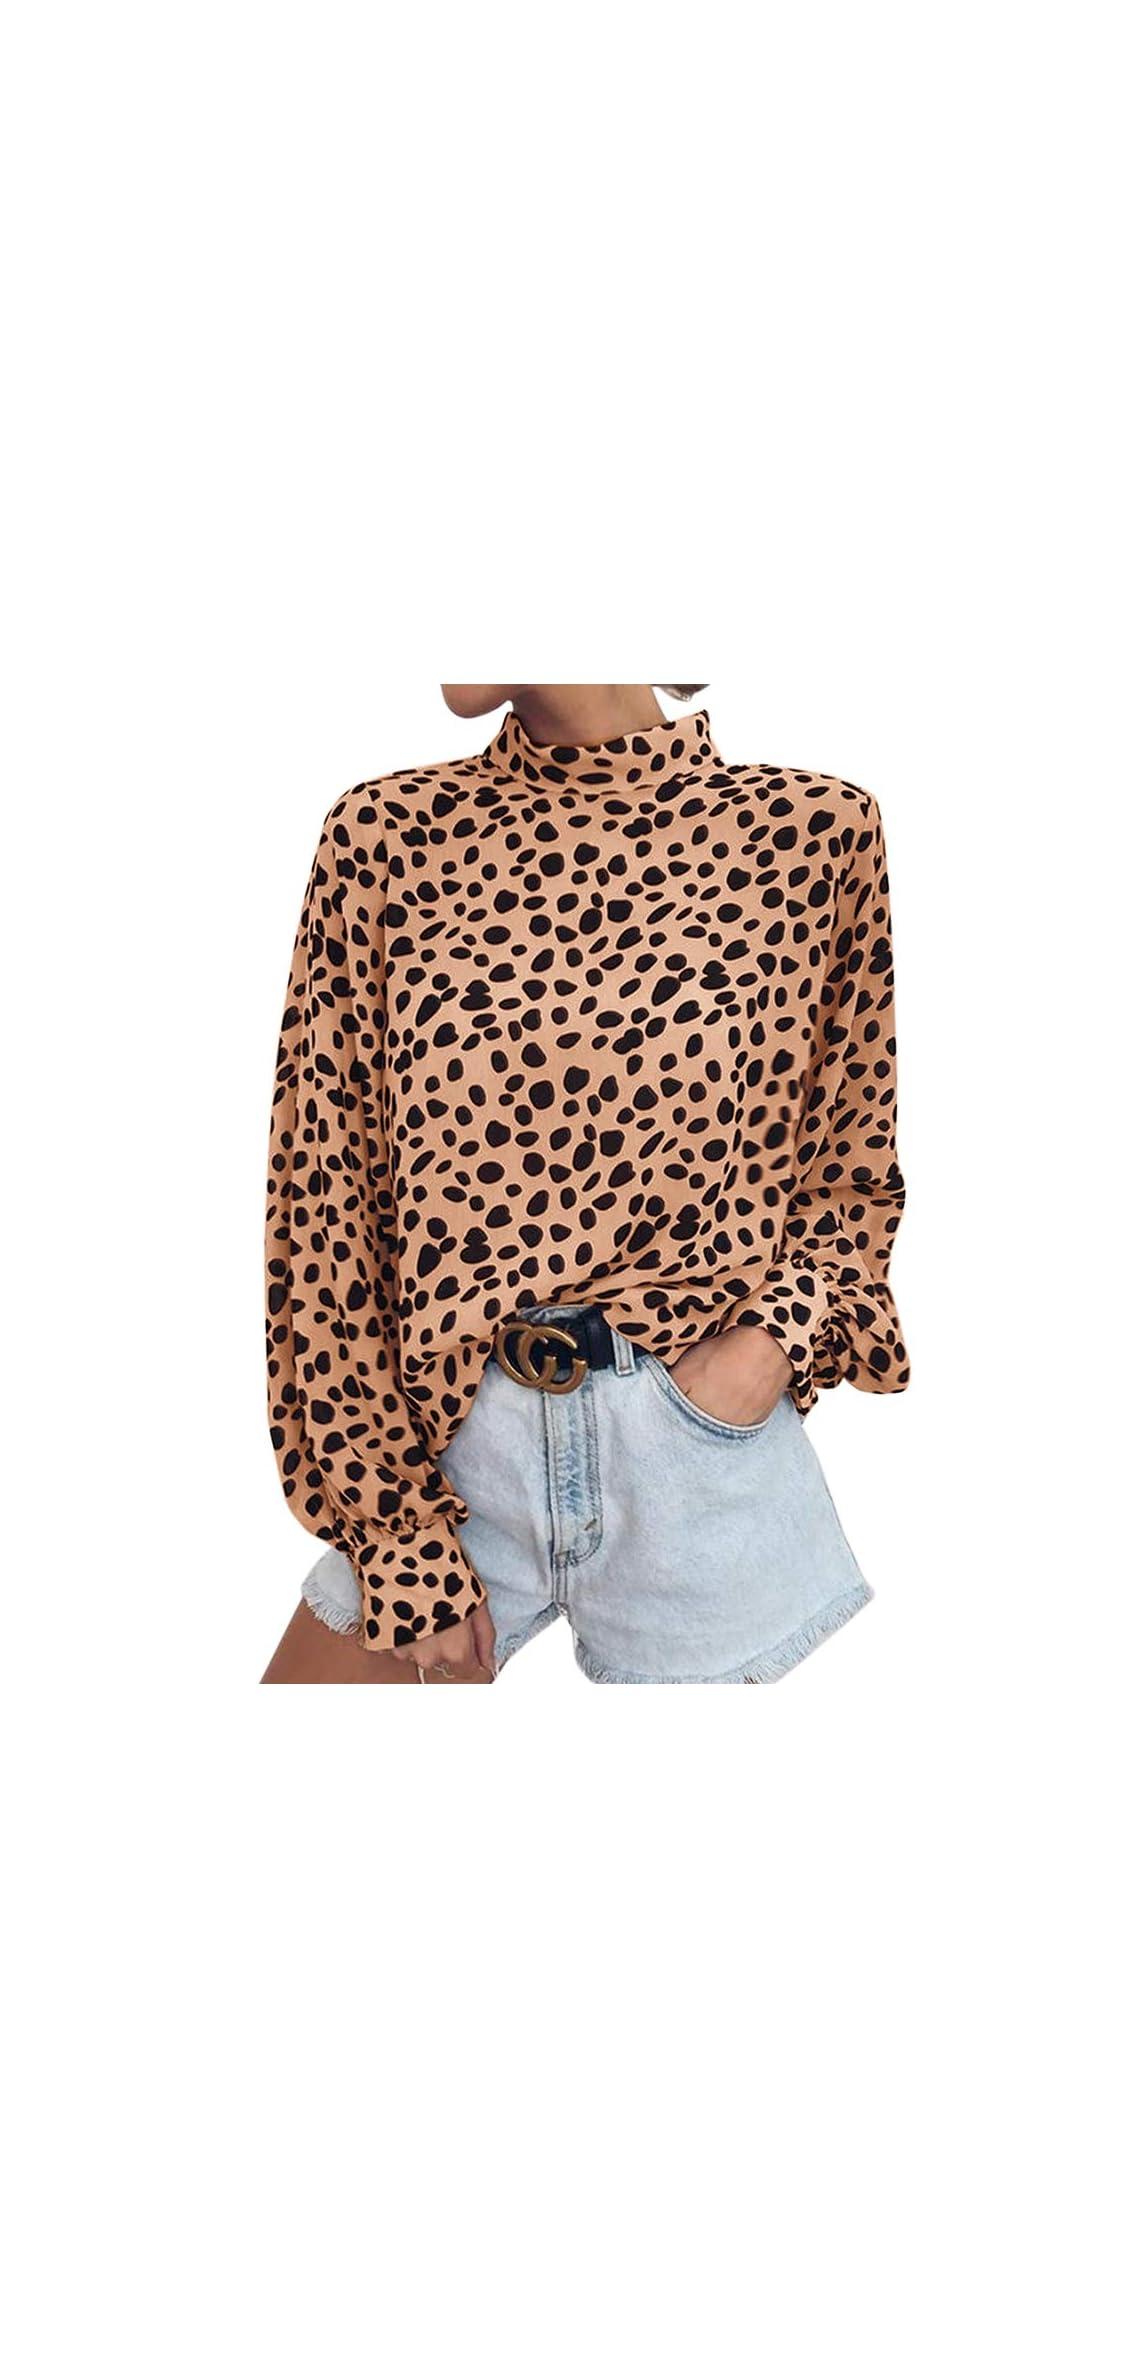 Womens Long Sleeve Turtleneck Blouse Leopard Print Tops